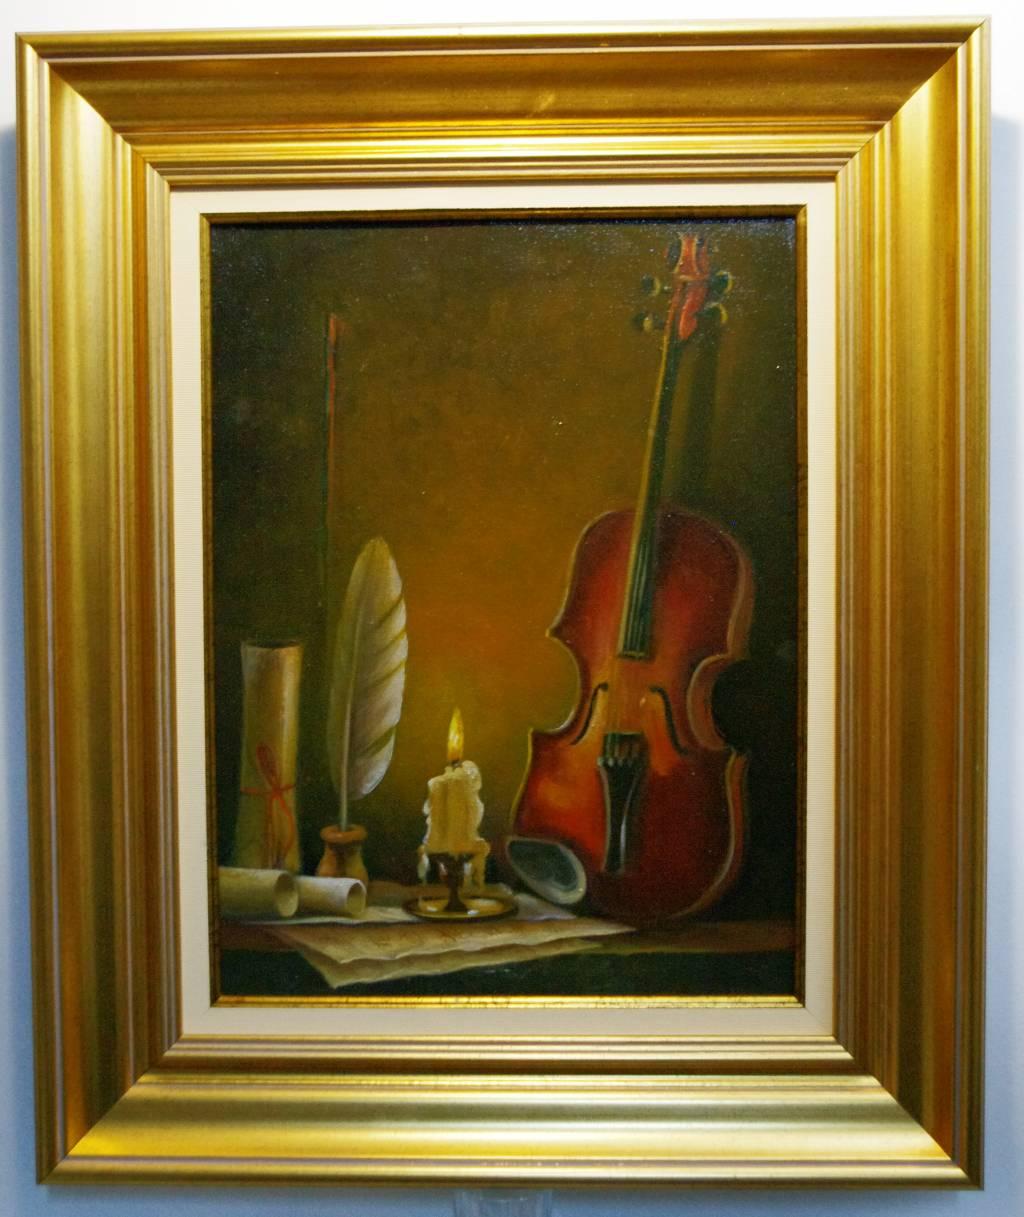 Poza vioara